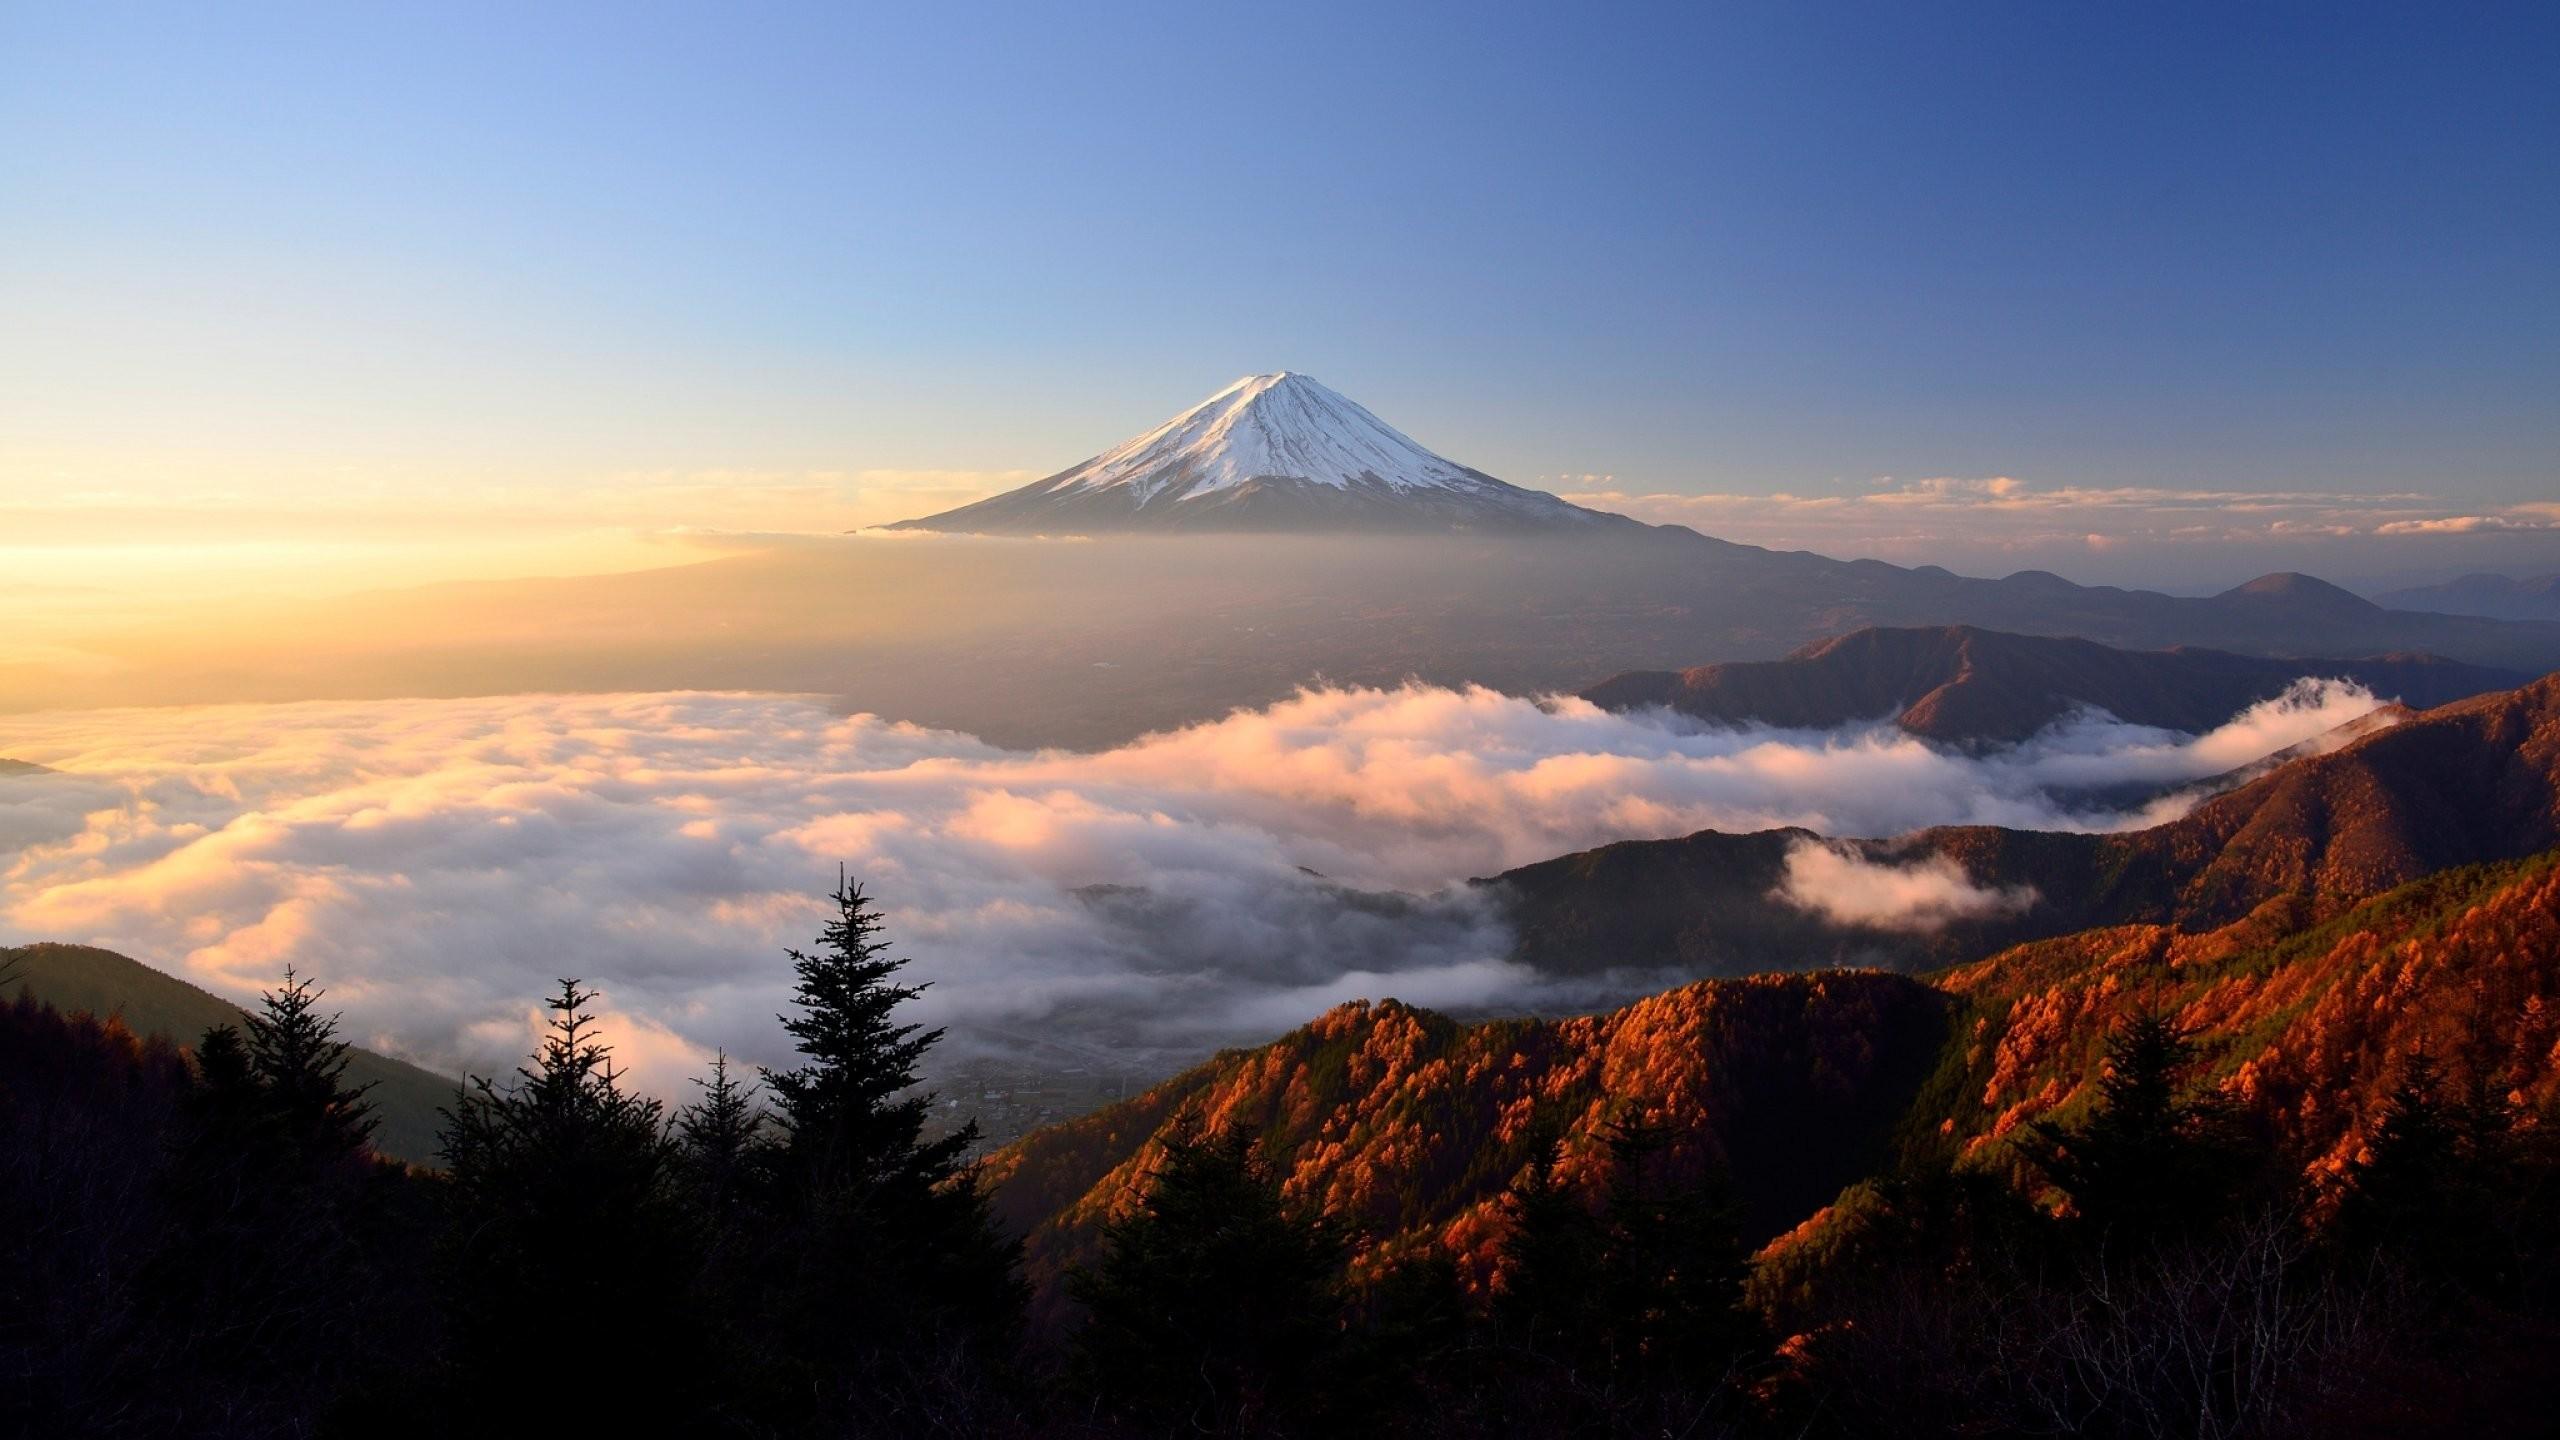 Res: 2560x1440, sunrise, morning, landscape, stratovolcano, volcano, japan, mount, fuji,  clouds Wallpaper HD